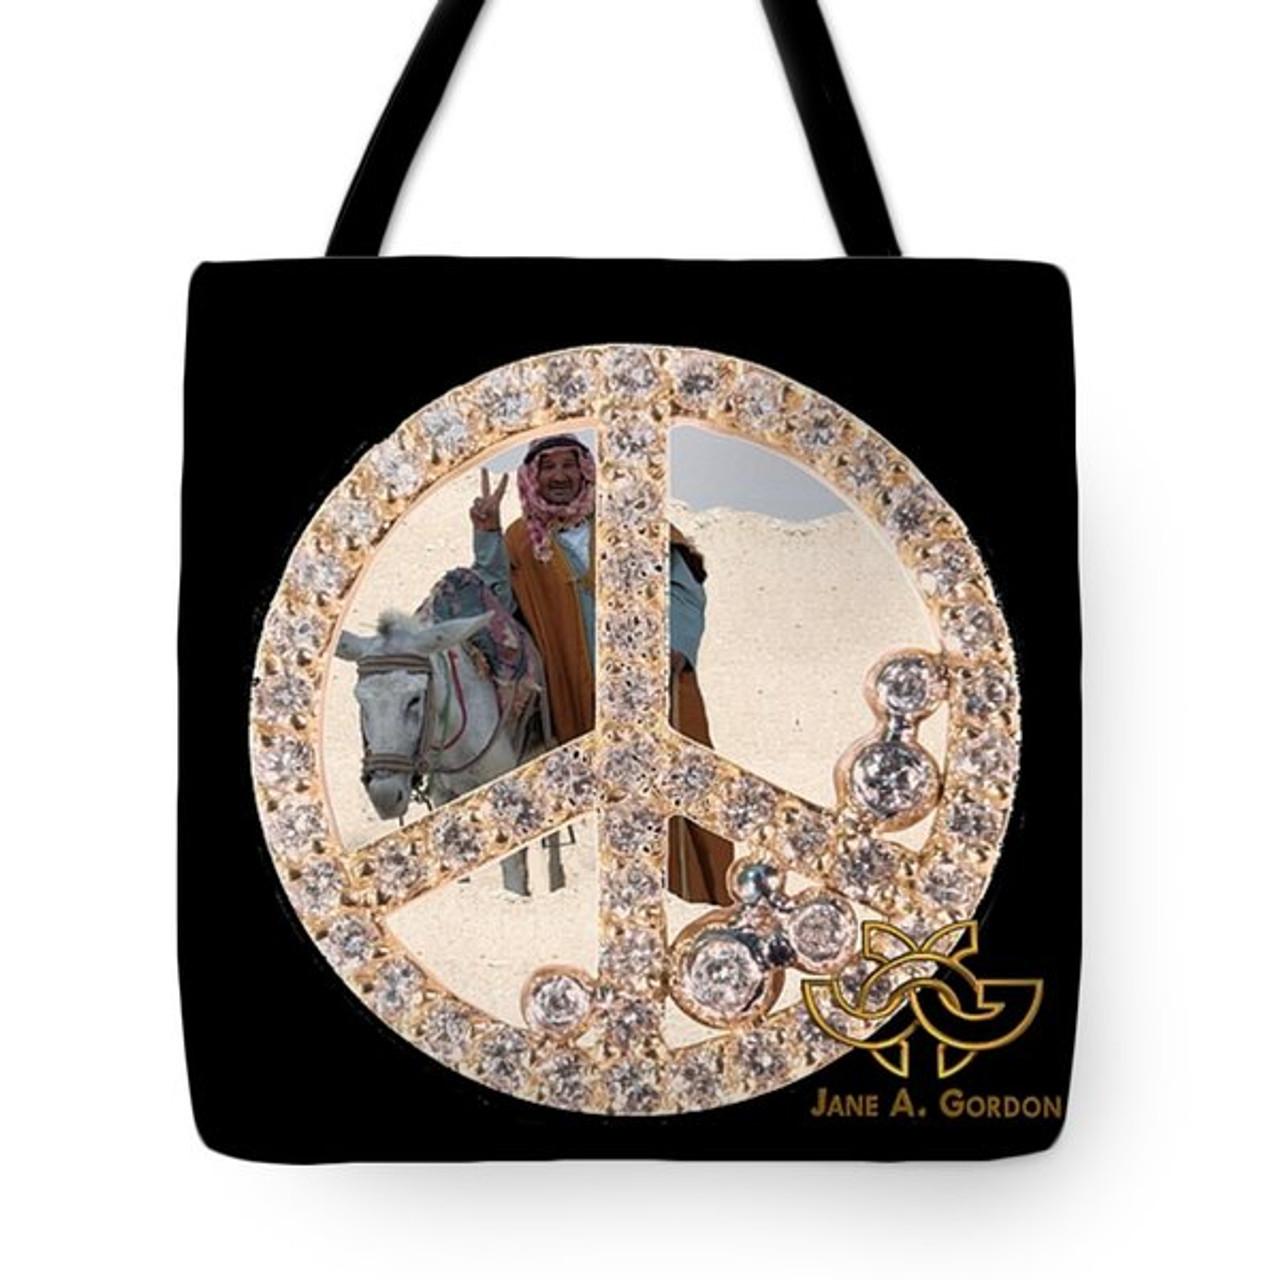 Peace inside peace. Art meets fashion in artful tote bags